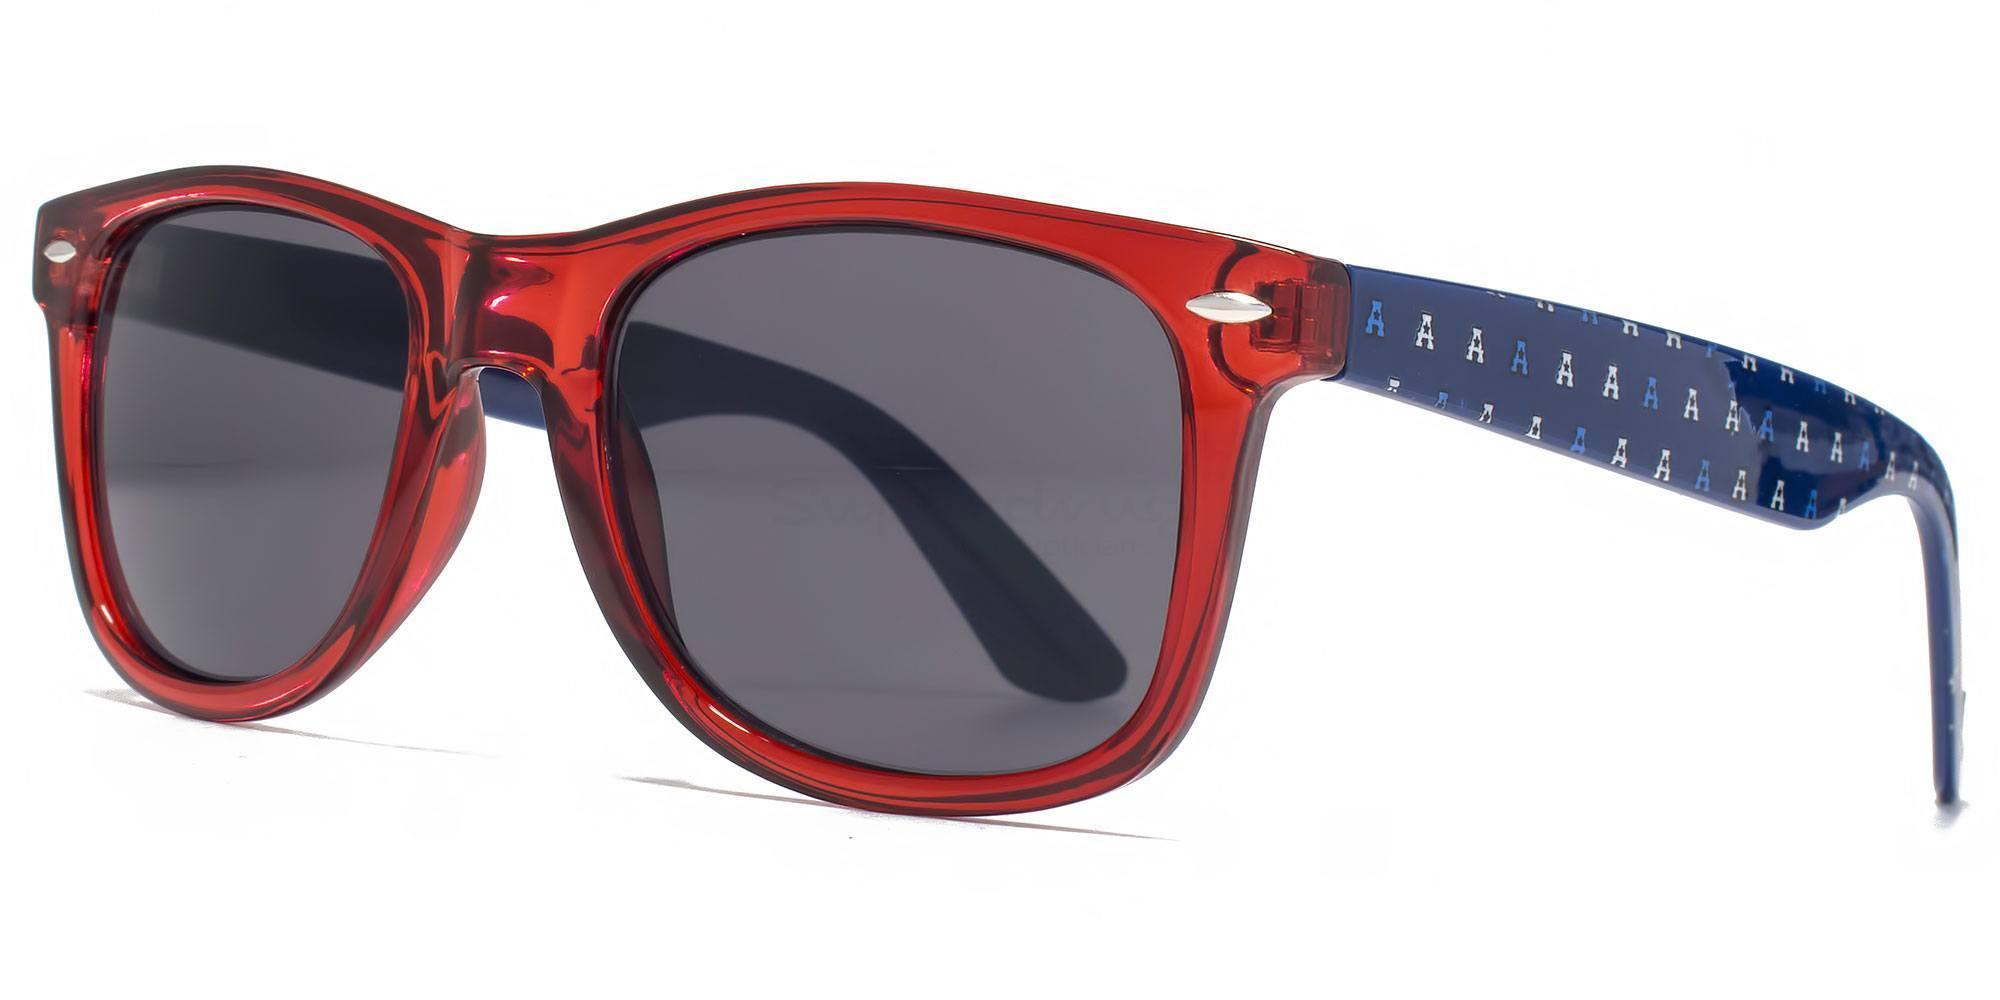 AFS002 BLAKE Sunglasses, American Freshman